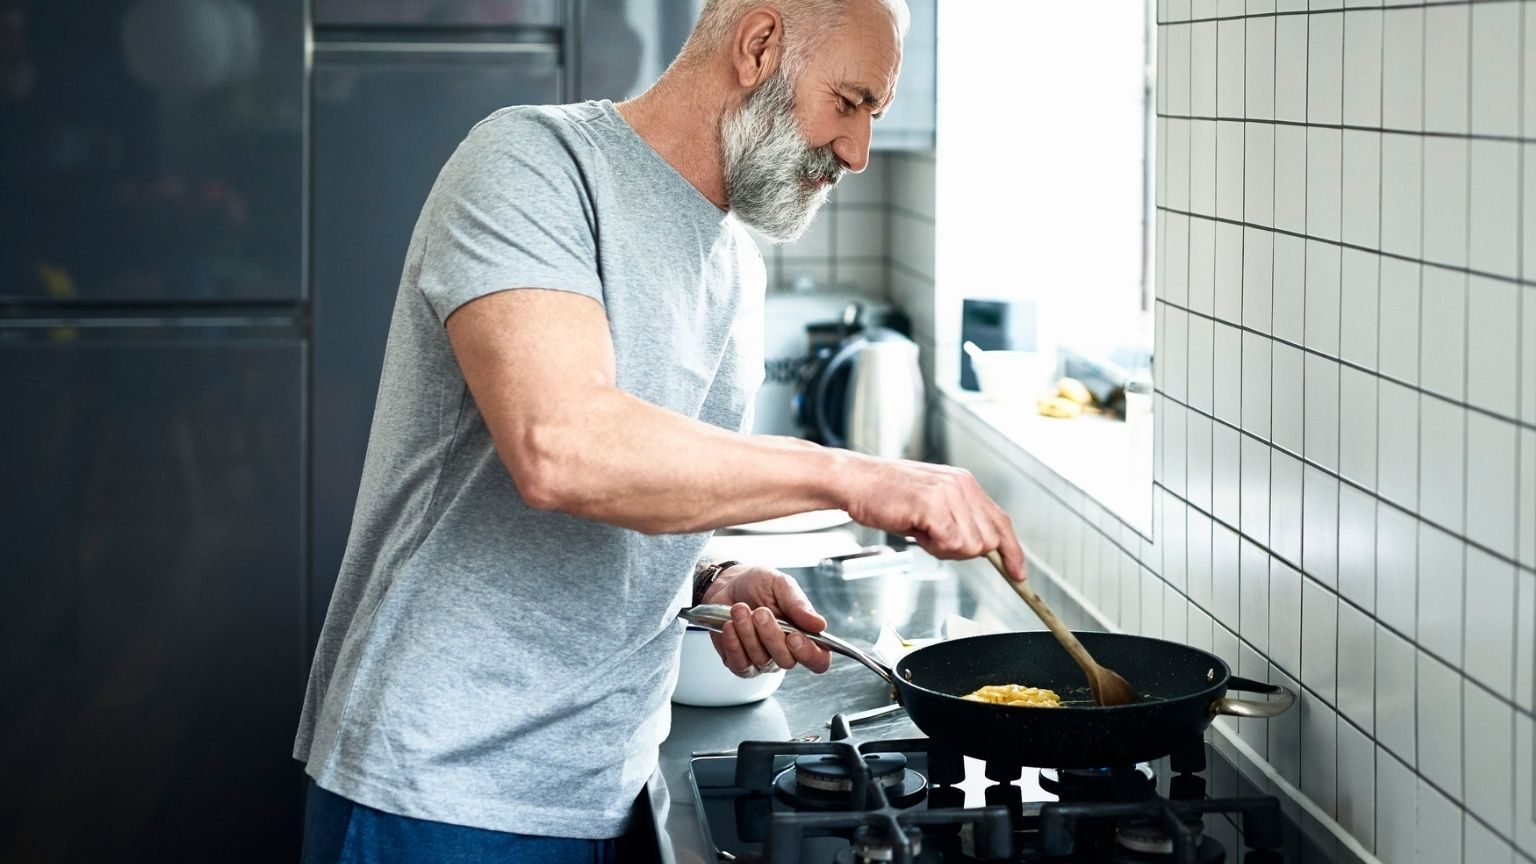 frying pan in modern kitchen_1536x864